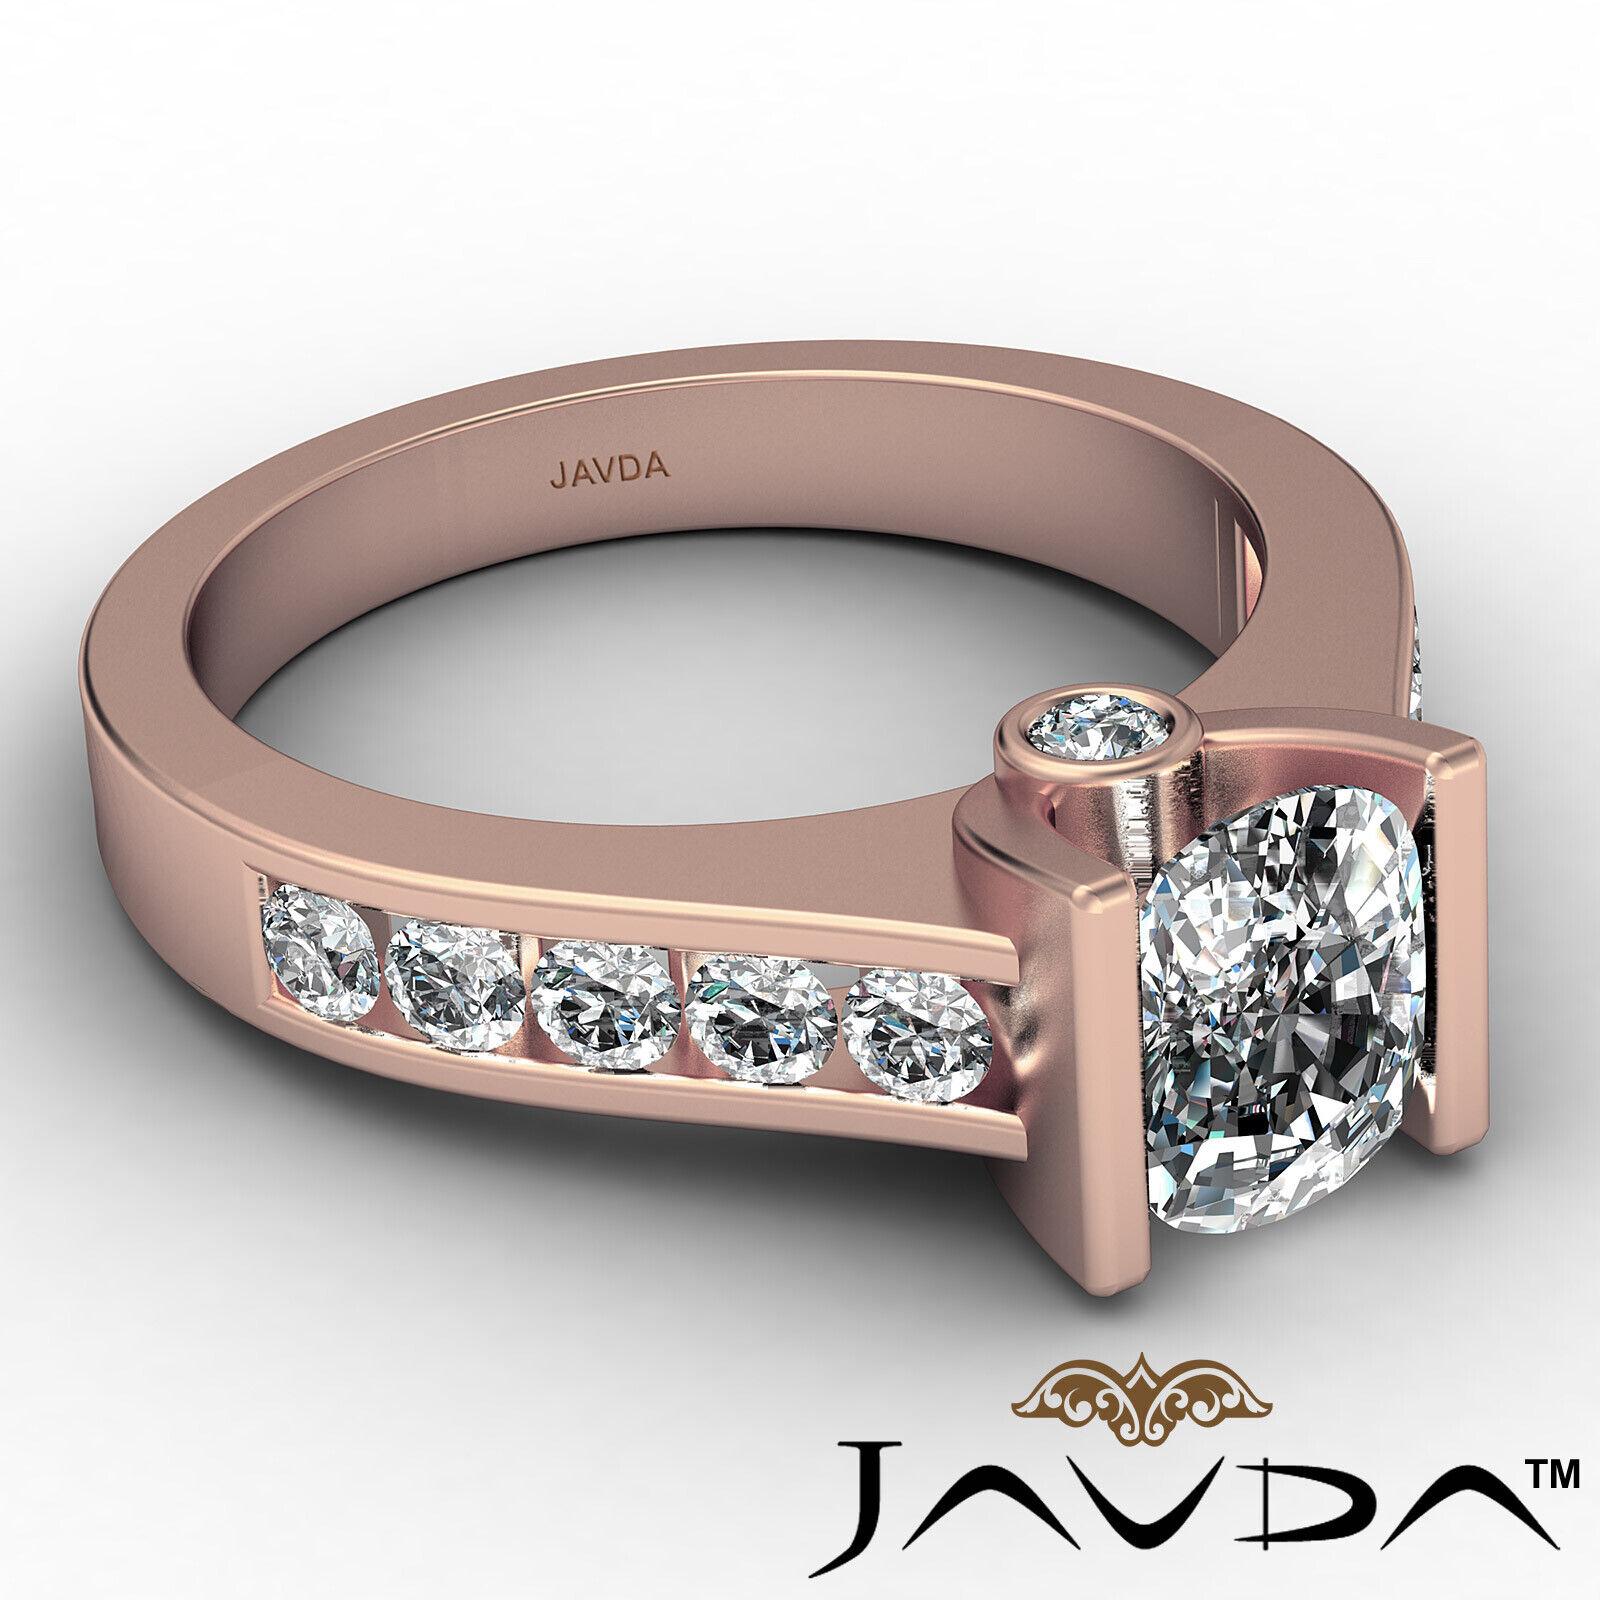 Bezel Cushion Diamond Engagement Women's Ring GIA, J Color SI1 clarity 1.53 ctw. 8